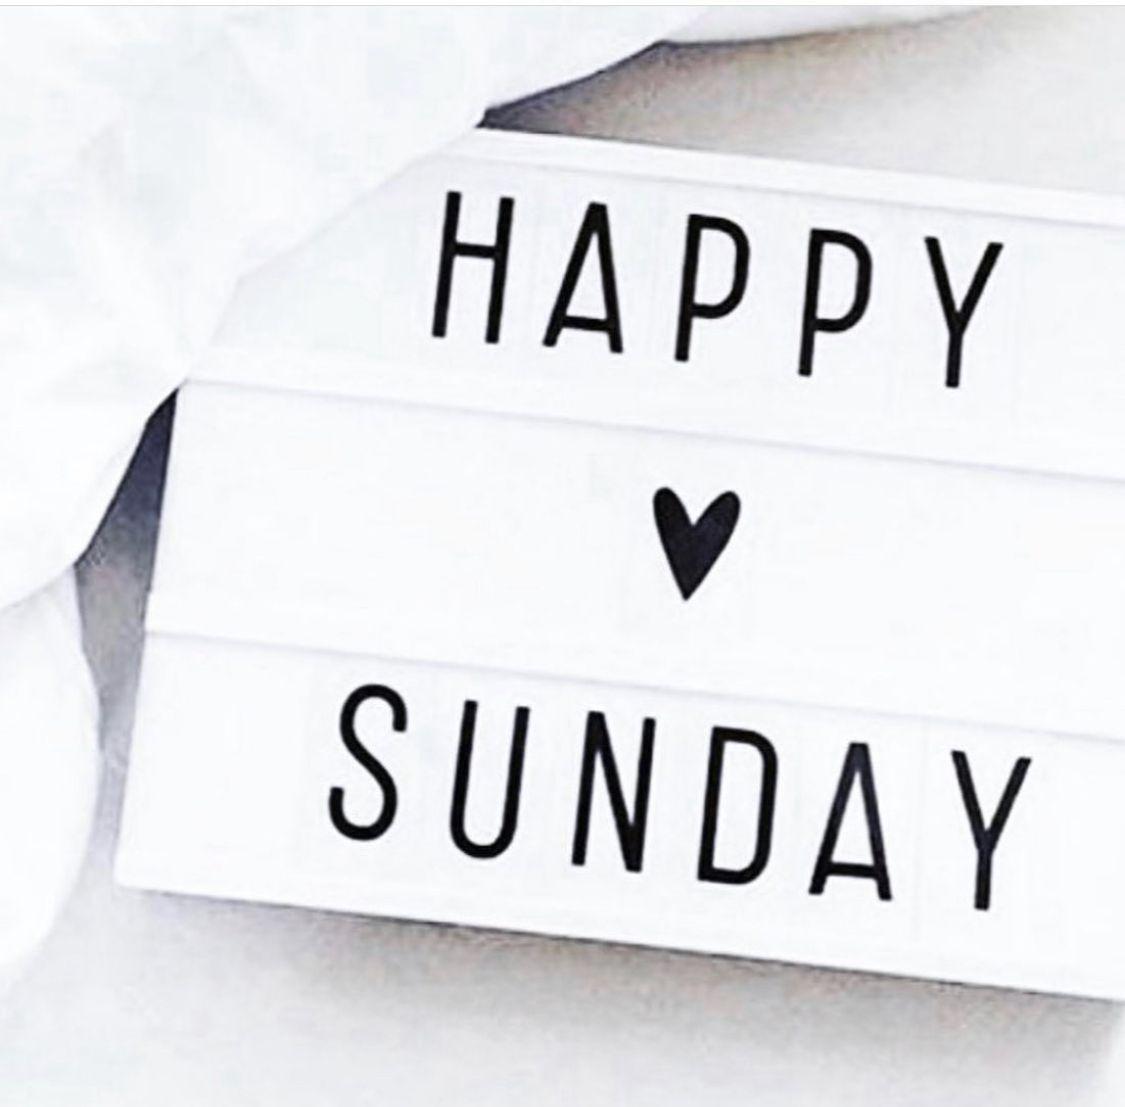 Happy Sunday 😀 #happysundayeveryone #happysundaymorning #happysundayyall #happysunday❤️ #happysunday💞 #facialplastics #facialplasticsurgery #facialplasticsurgeon #dallasfacialplasticsurgery #dallasdoctor #dallascosmeti